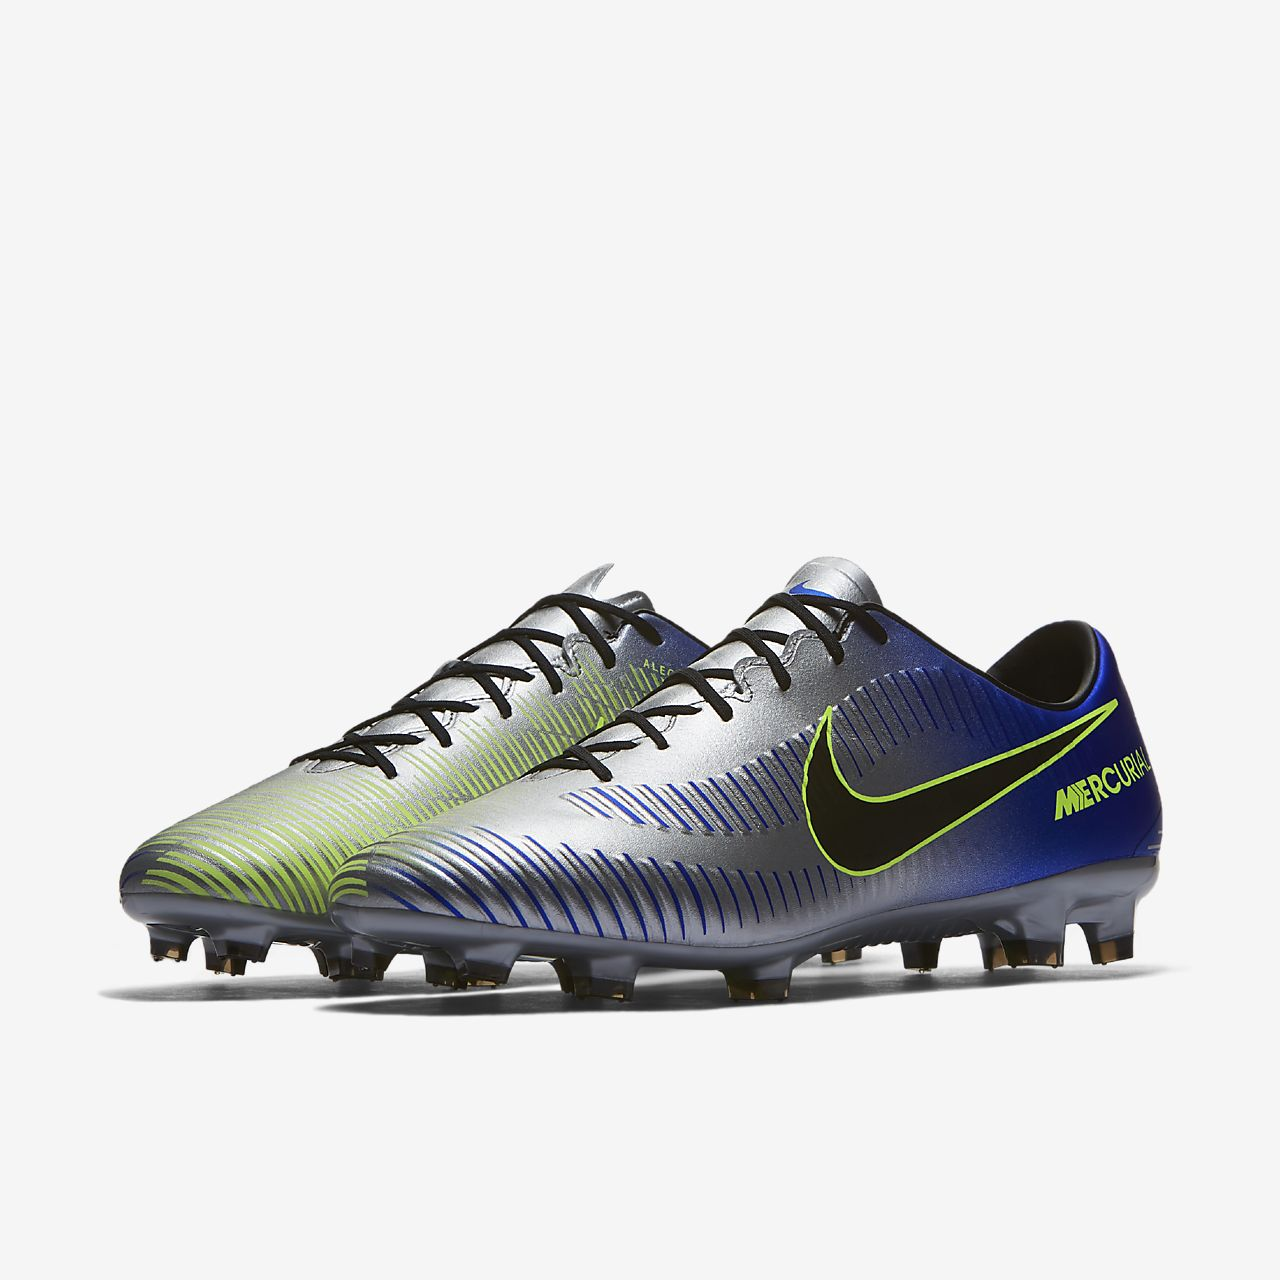 Chaussures Bleu Nike Mercurial Veloce wcAU9wx